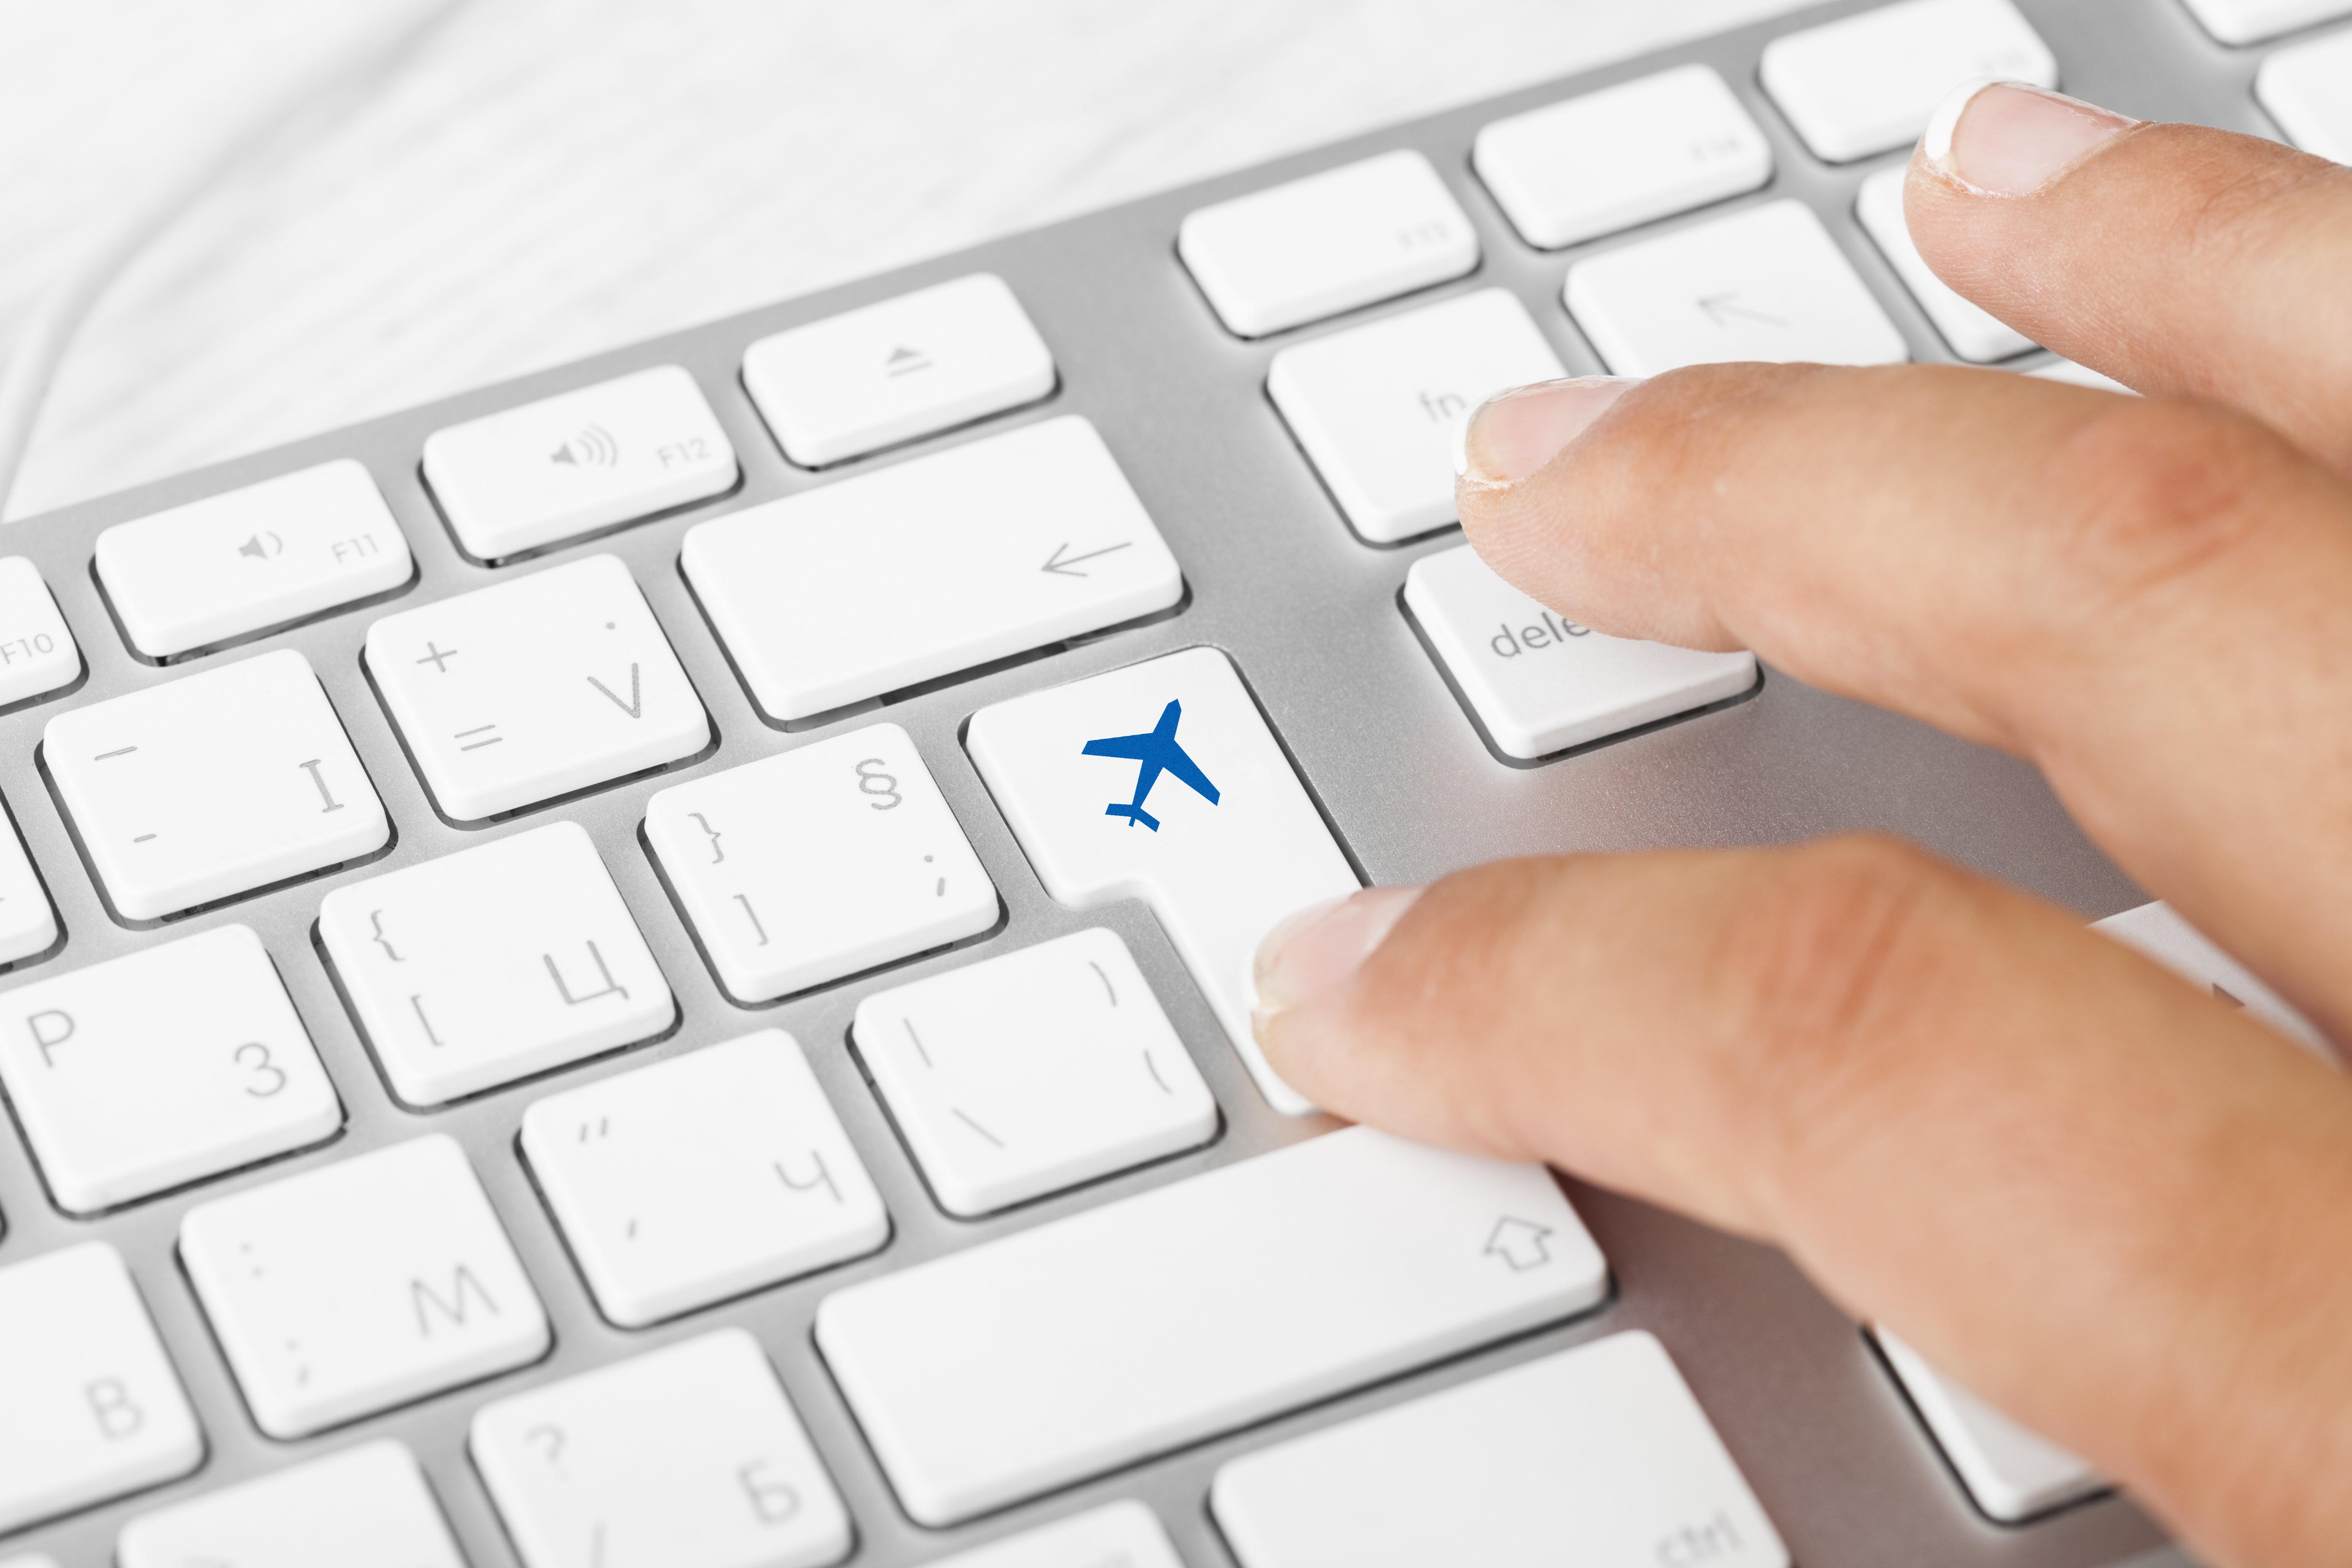 Plane Key On Computer Keyboard